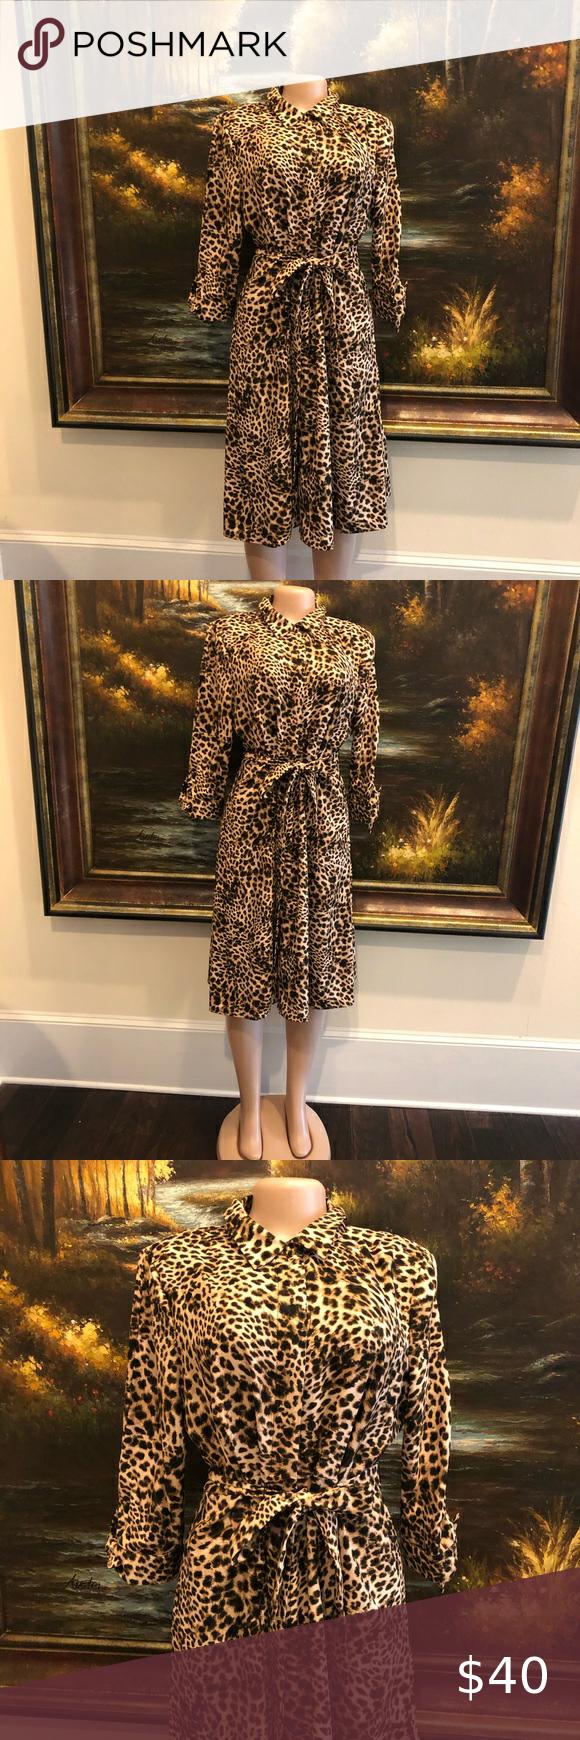 Calvin Klein Cheetah Print Dress Calvin Klein Collared Button Up Cheetah Print Wrap Dress Long Sleeve And Cheetah Print Dress Print Dress Printed Wrap Dresses [ 1740 x 580 Pixel ]